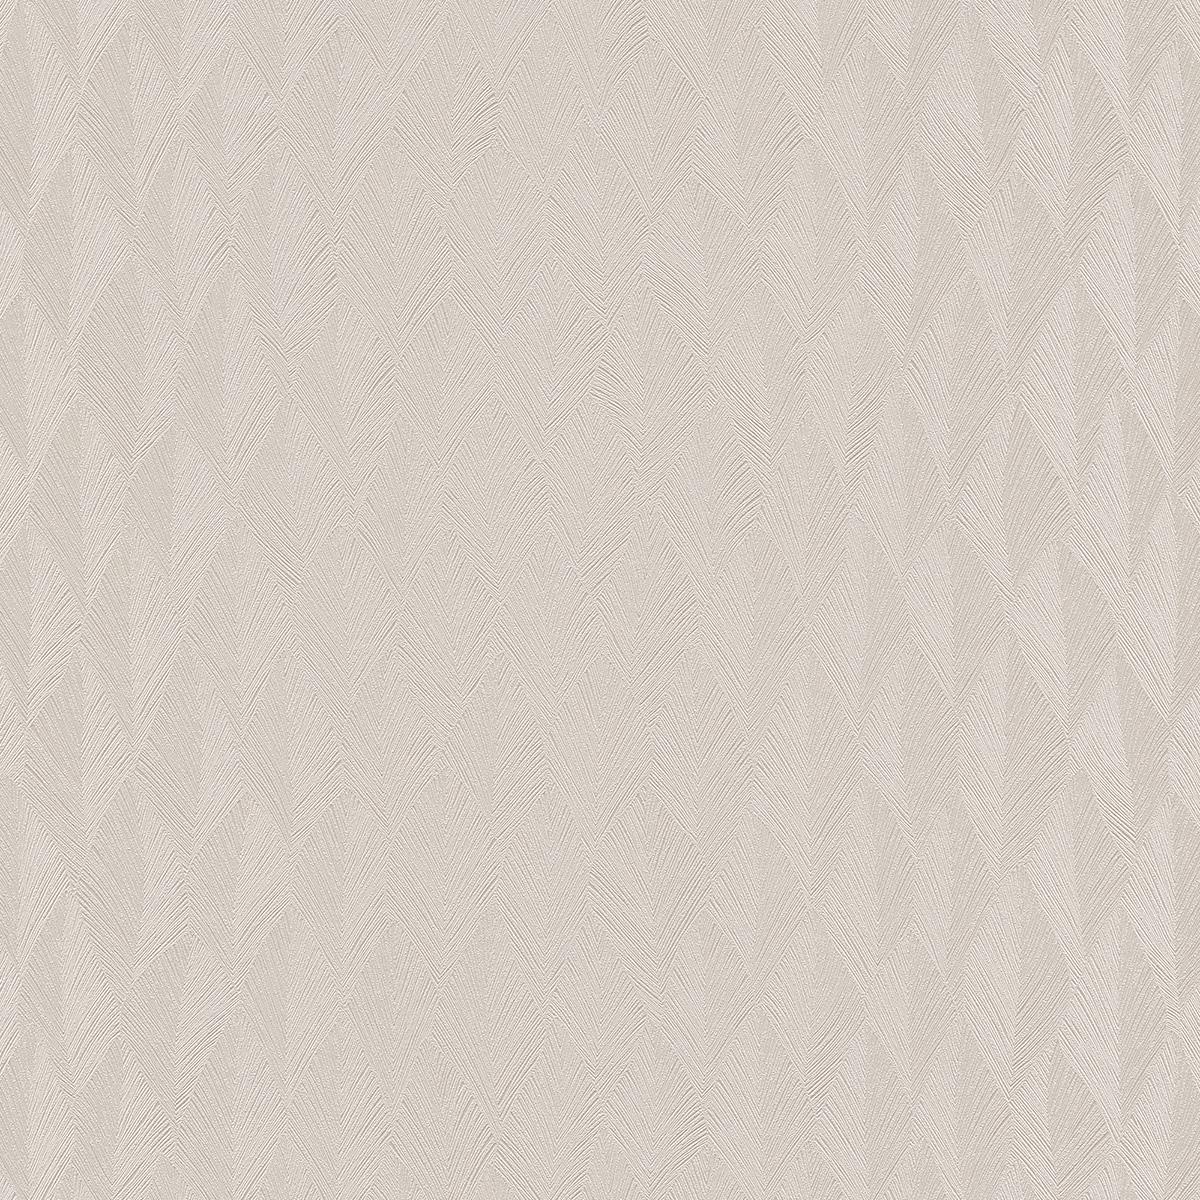 тапет Фешън 4Уолс крем отпечатък листа